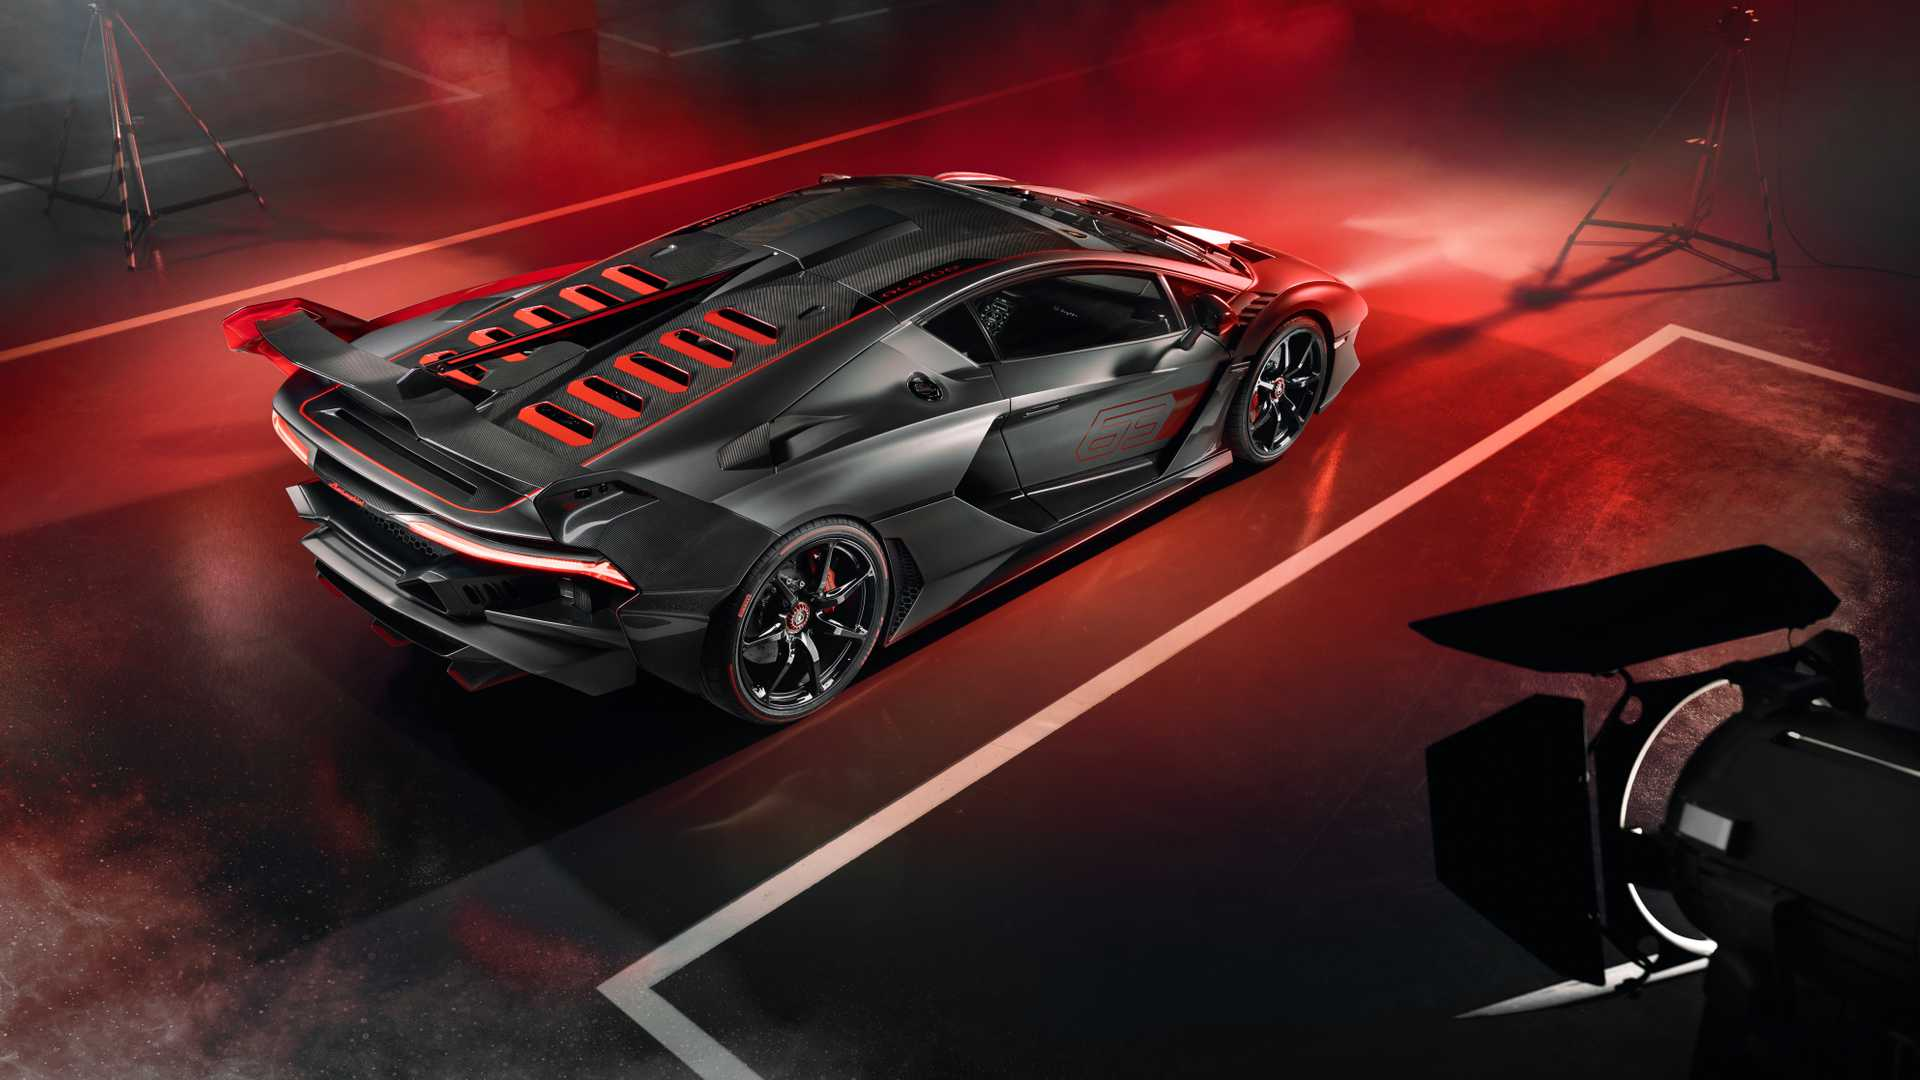 2019 Lamborghini SC18 Alston Rear Three-Quarter Wallpapers (13)